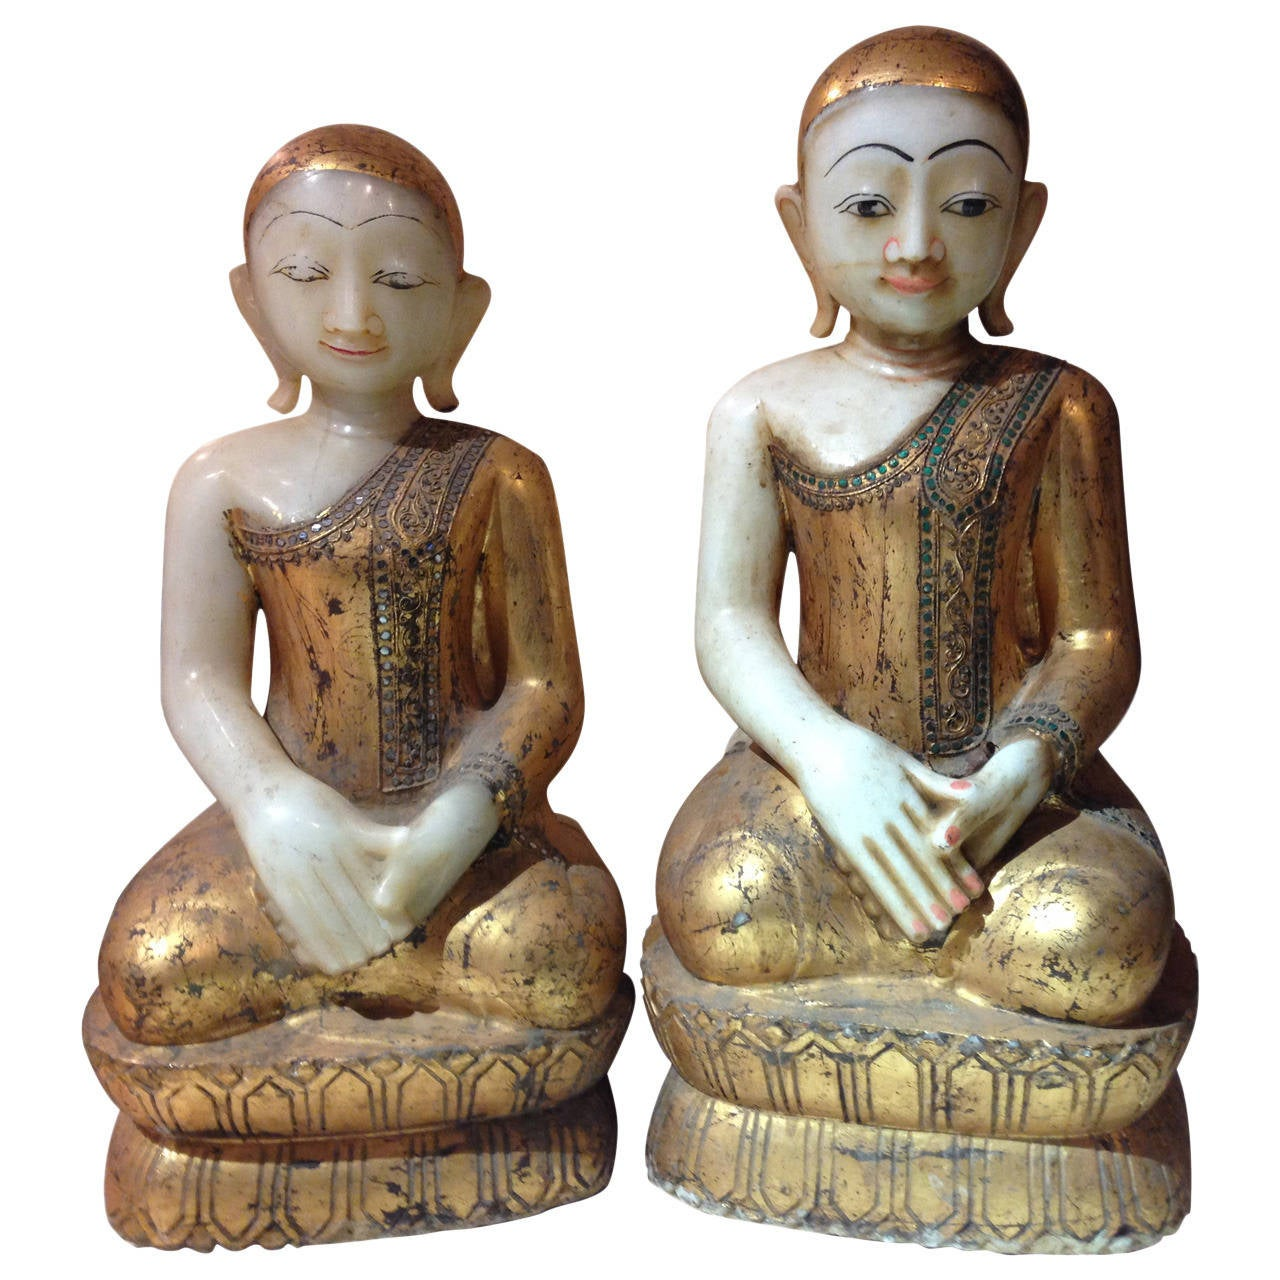 Antique Pair Hand-Carved Hand Gilt Stone Garden Attendants Joyful Faces